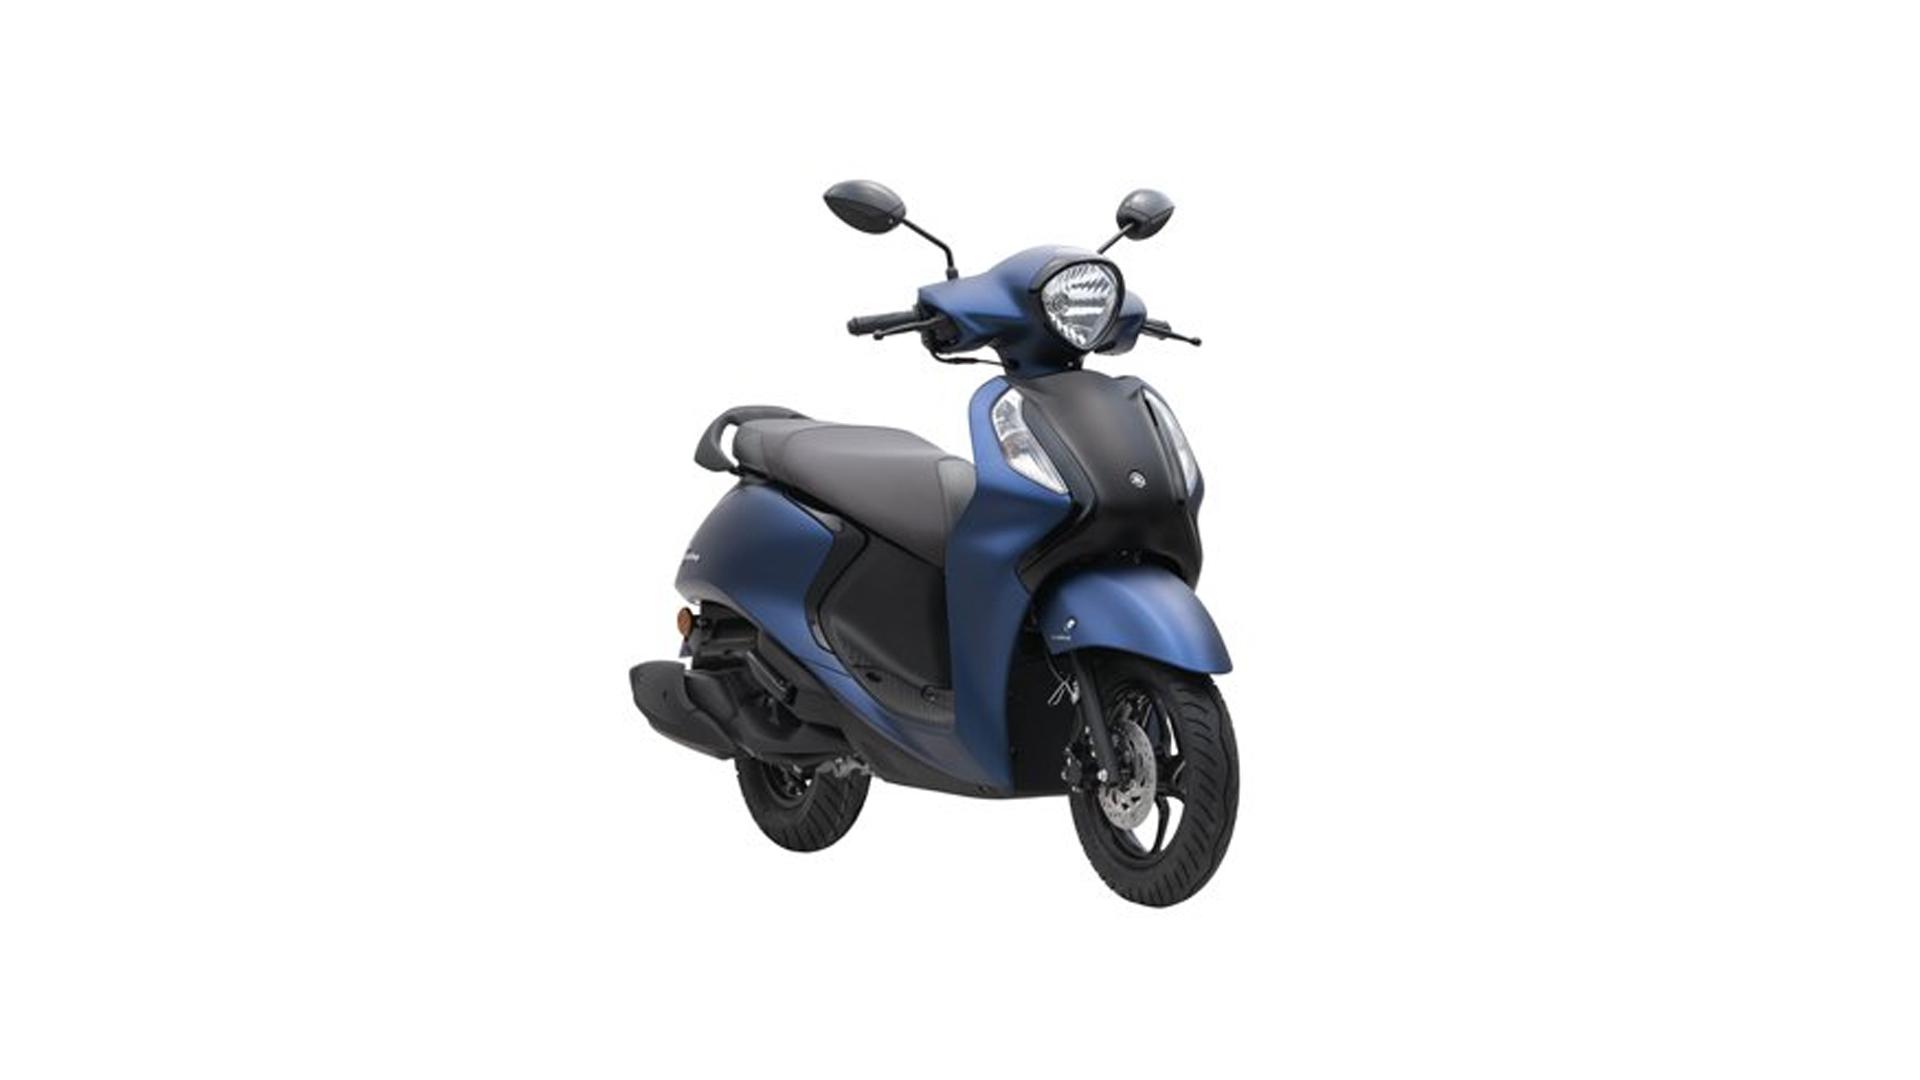 Yamaha Fascino 125 Fi Image